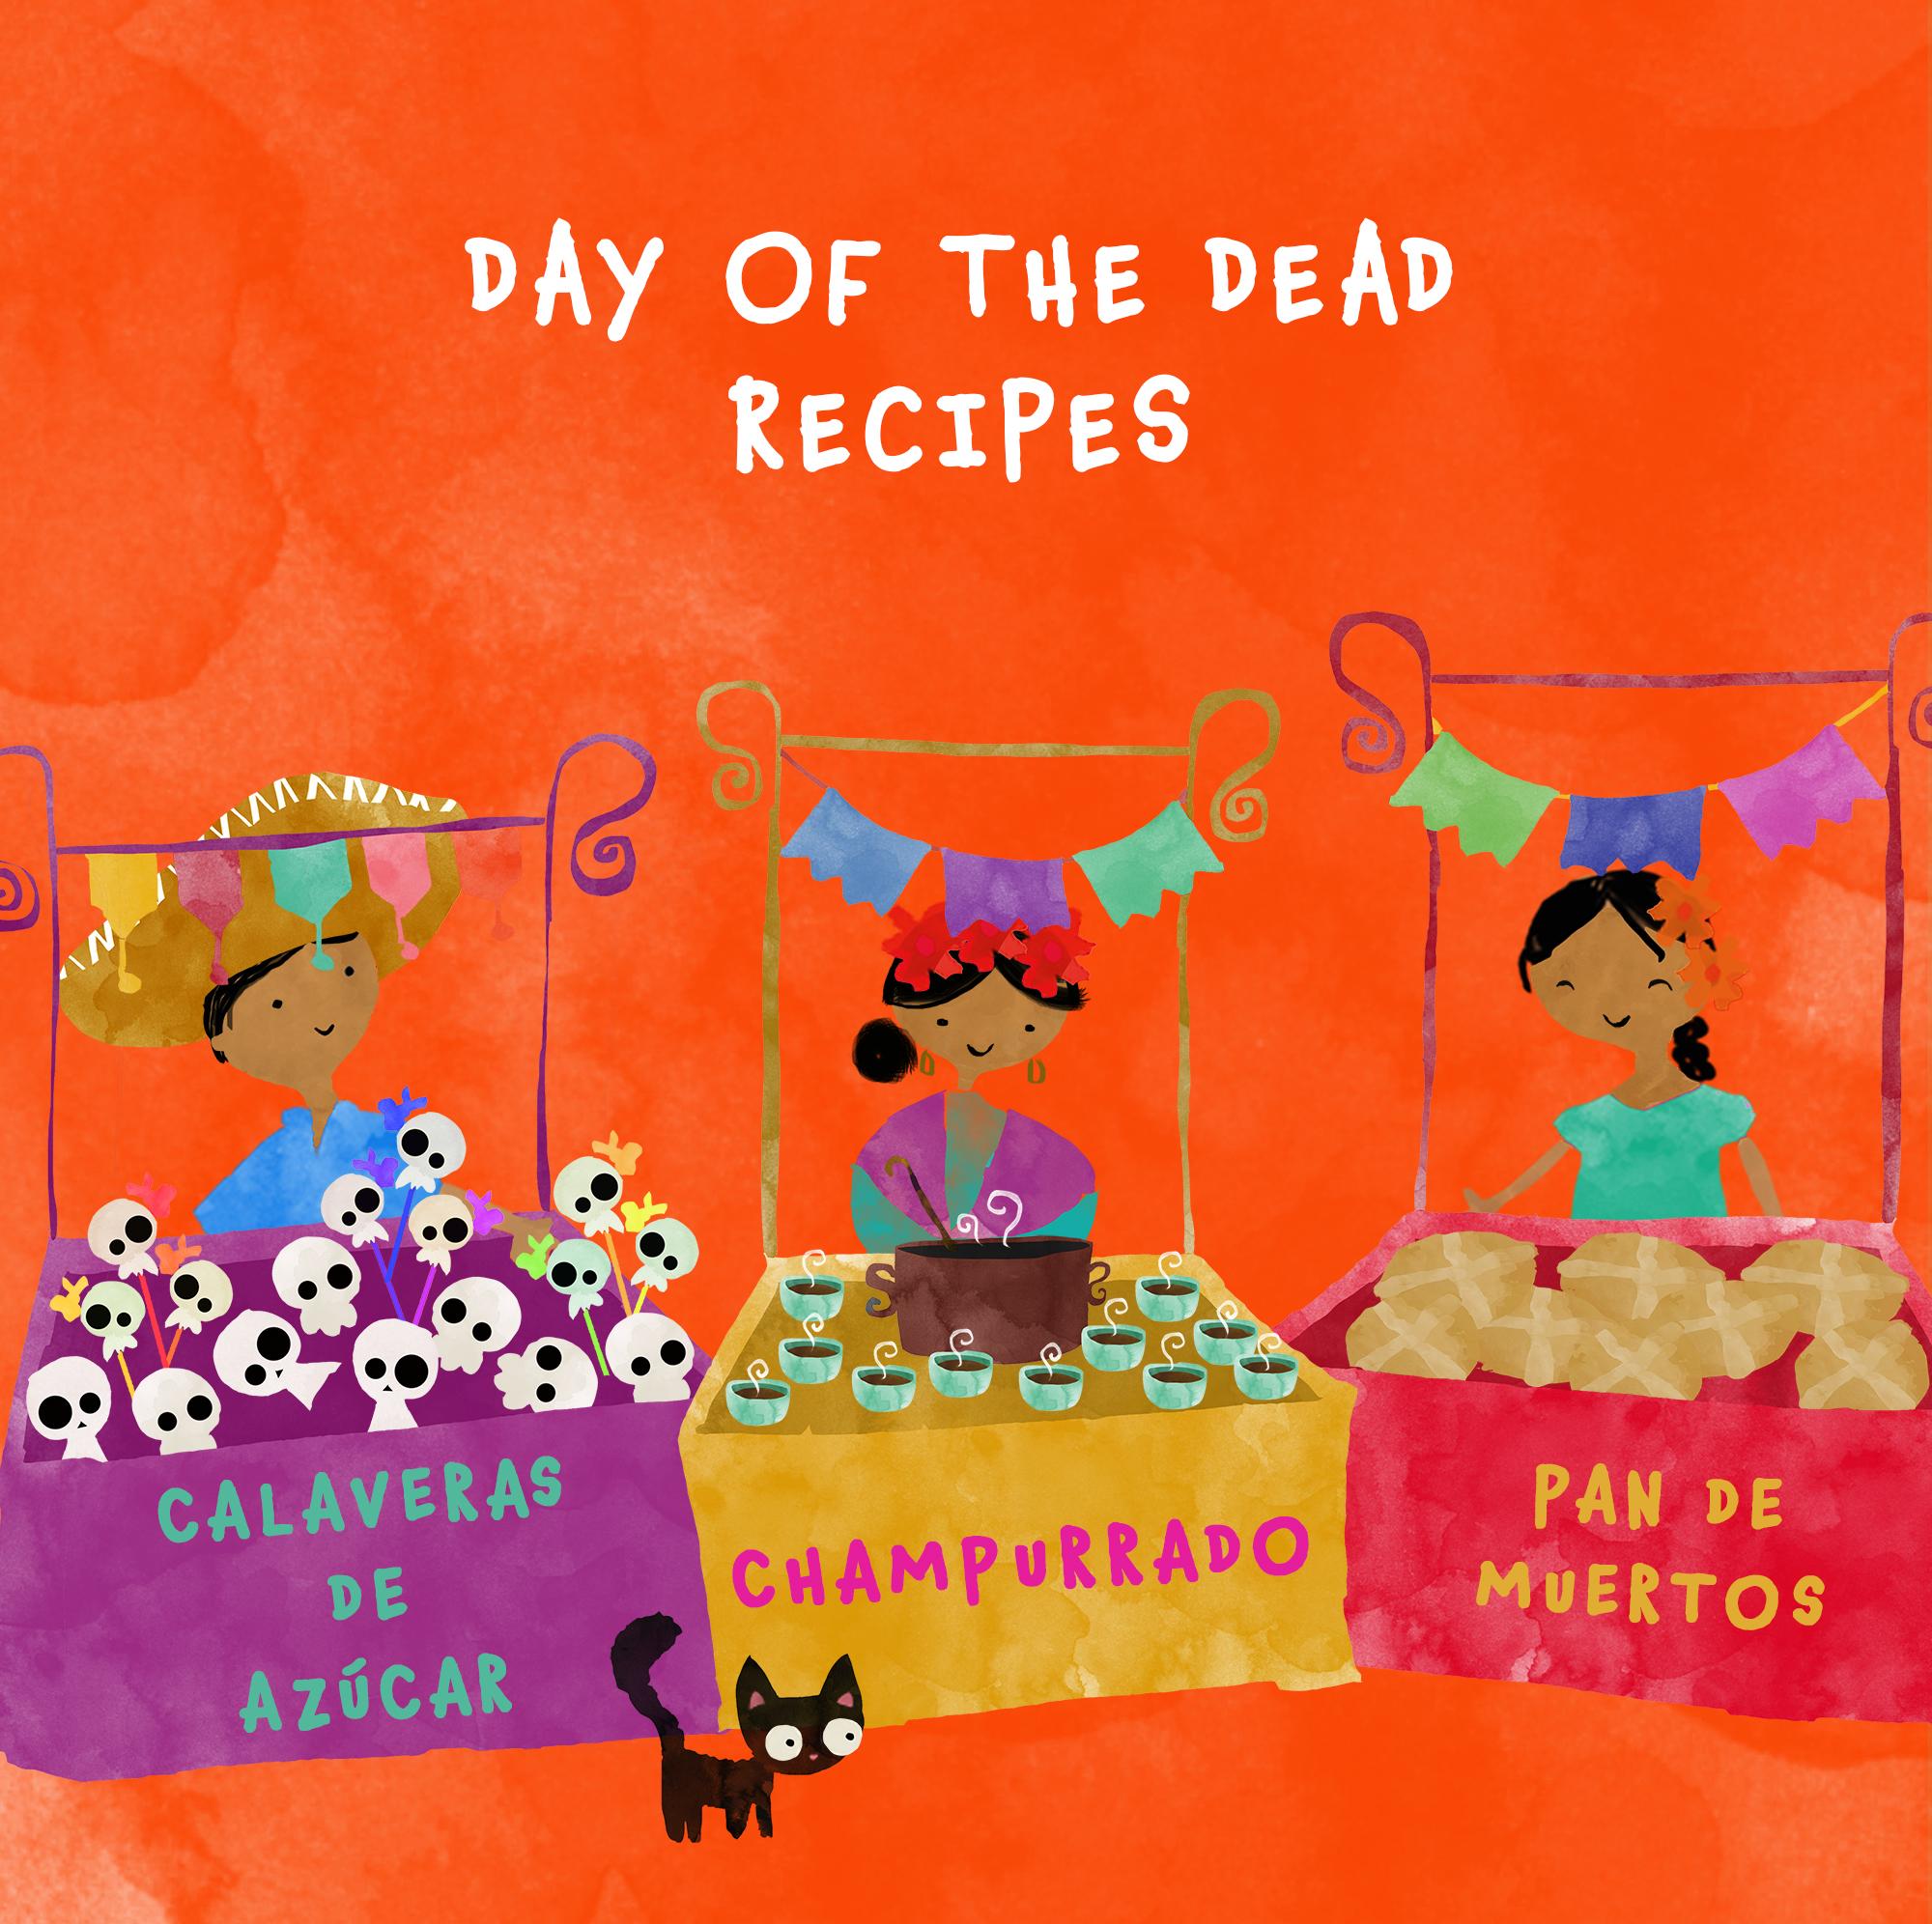 worldwide_buddies_day_of_the_dead_recipes.jpg